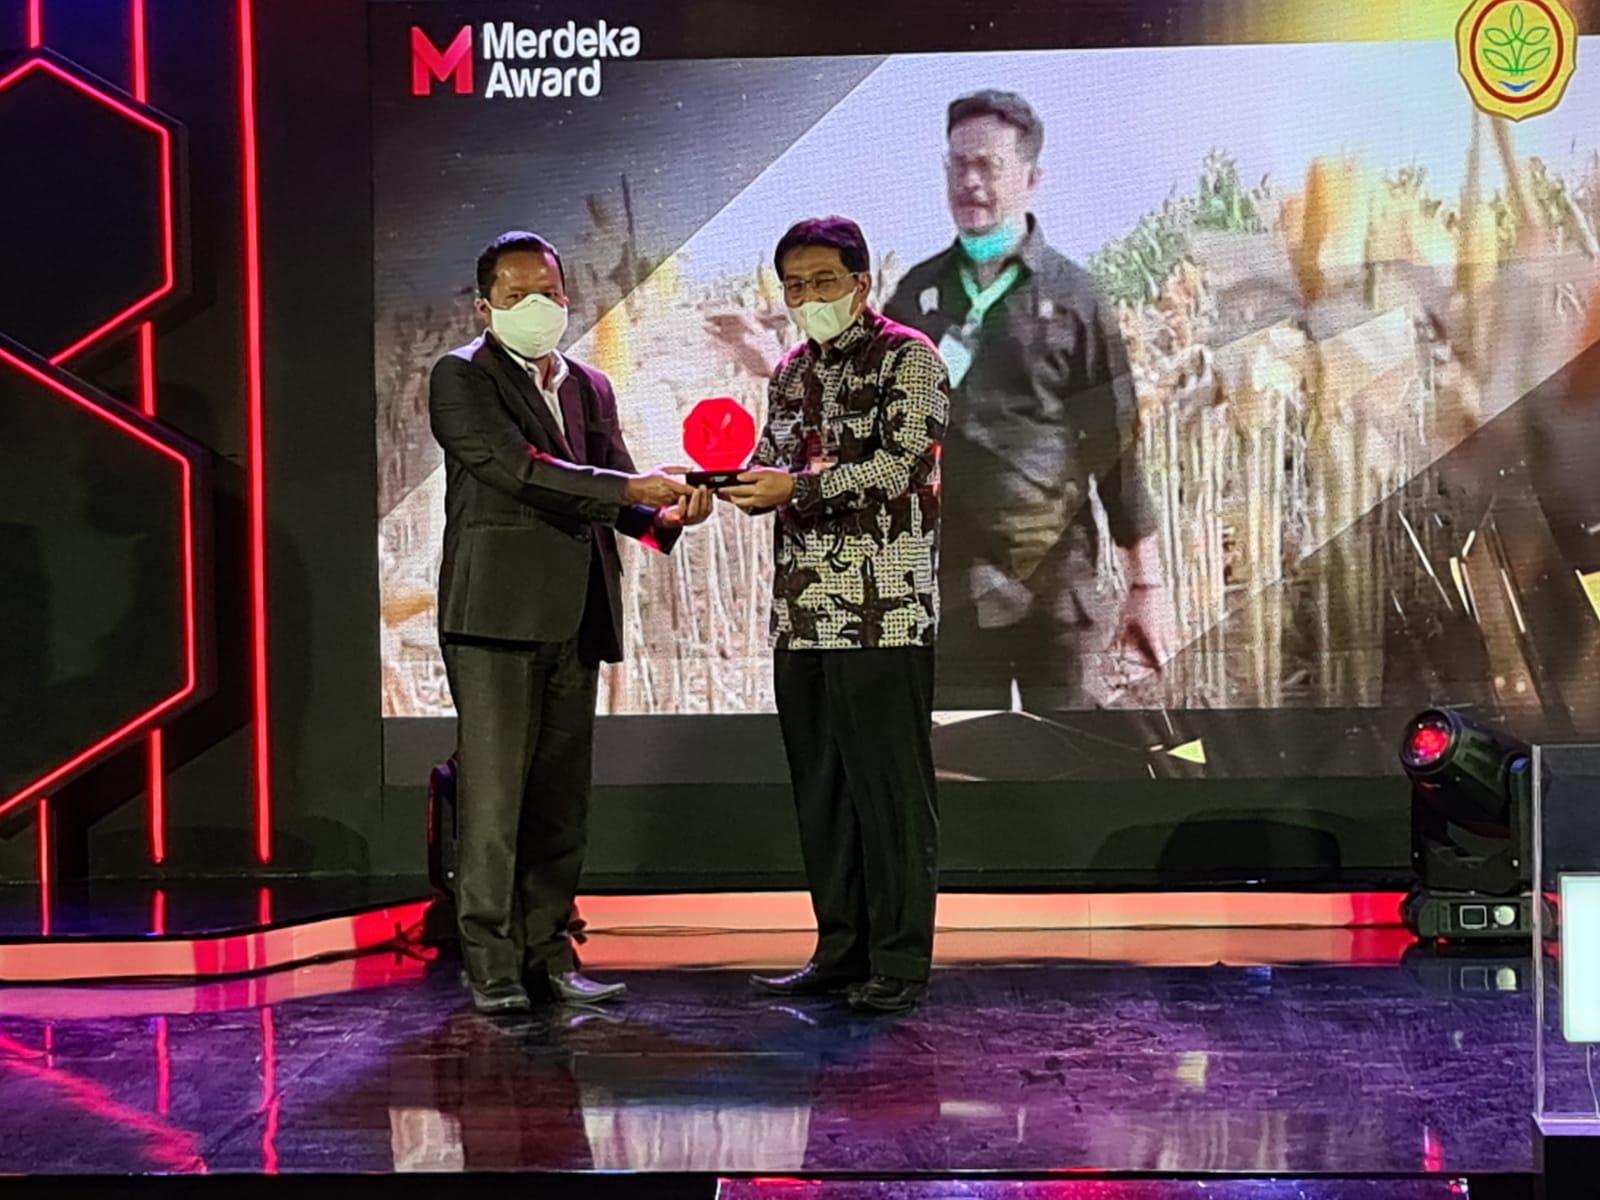 Program Inovatif Selama Pandemi, Kementan RI Raih Merdeka Award